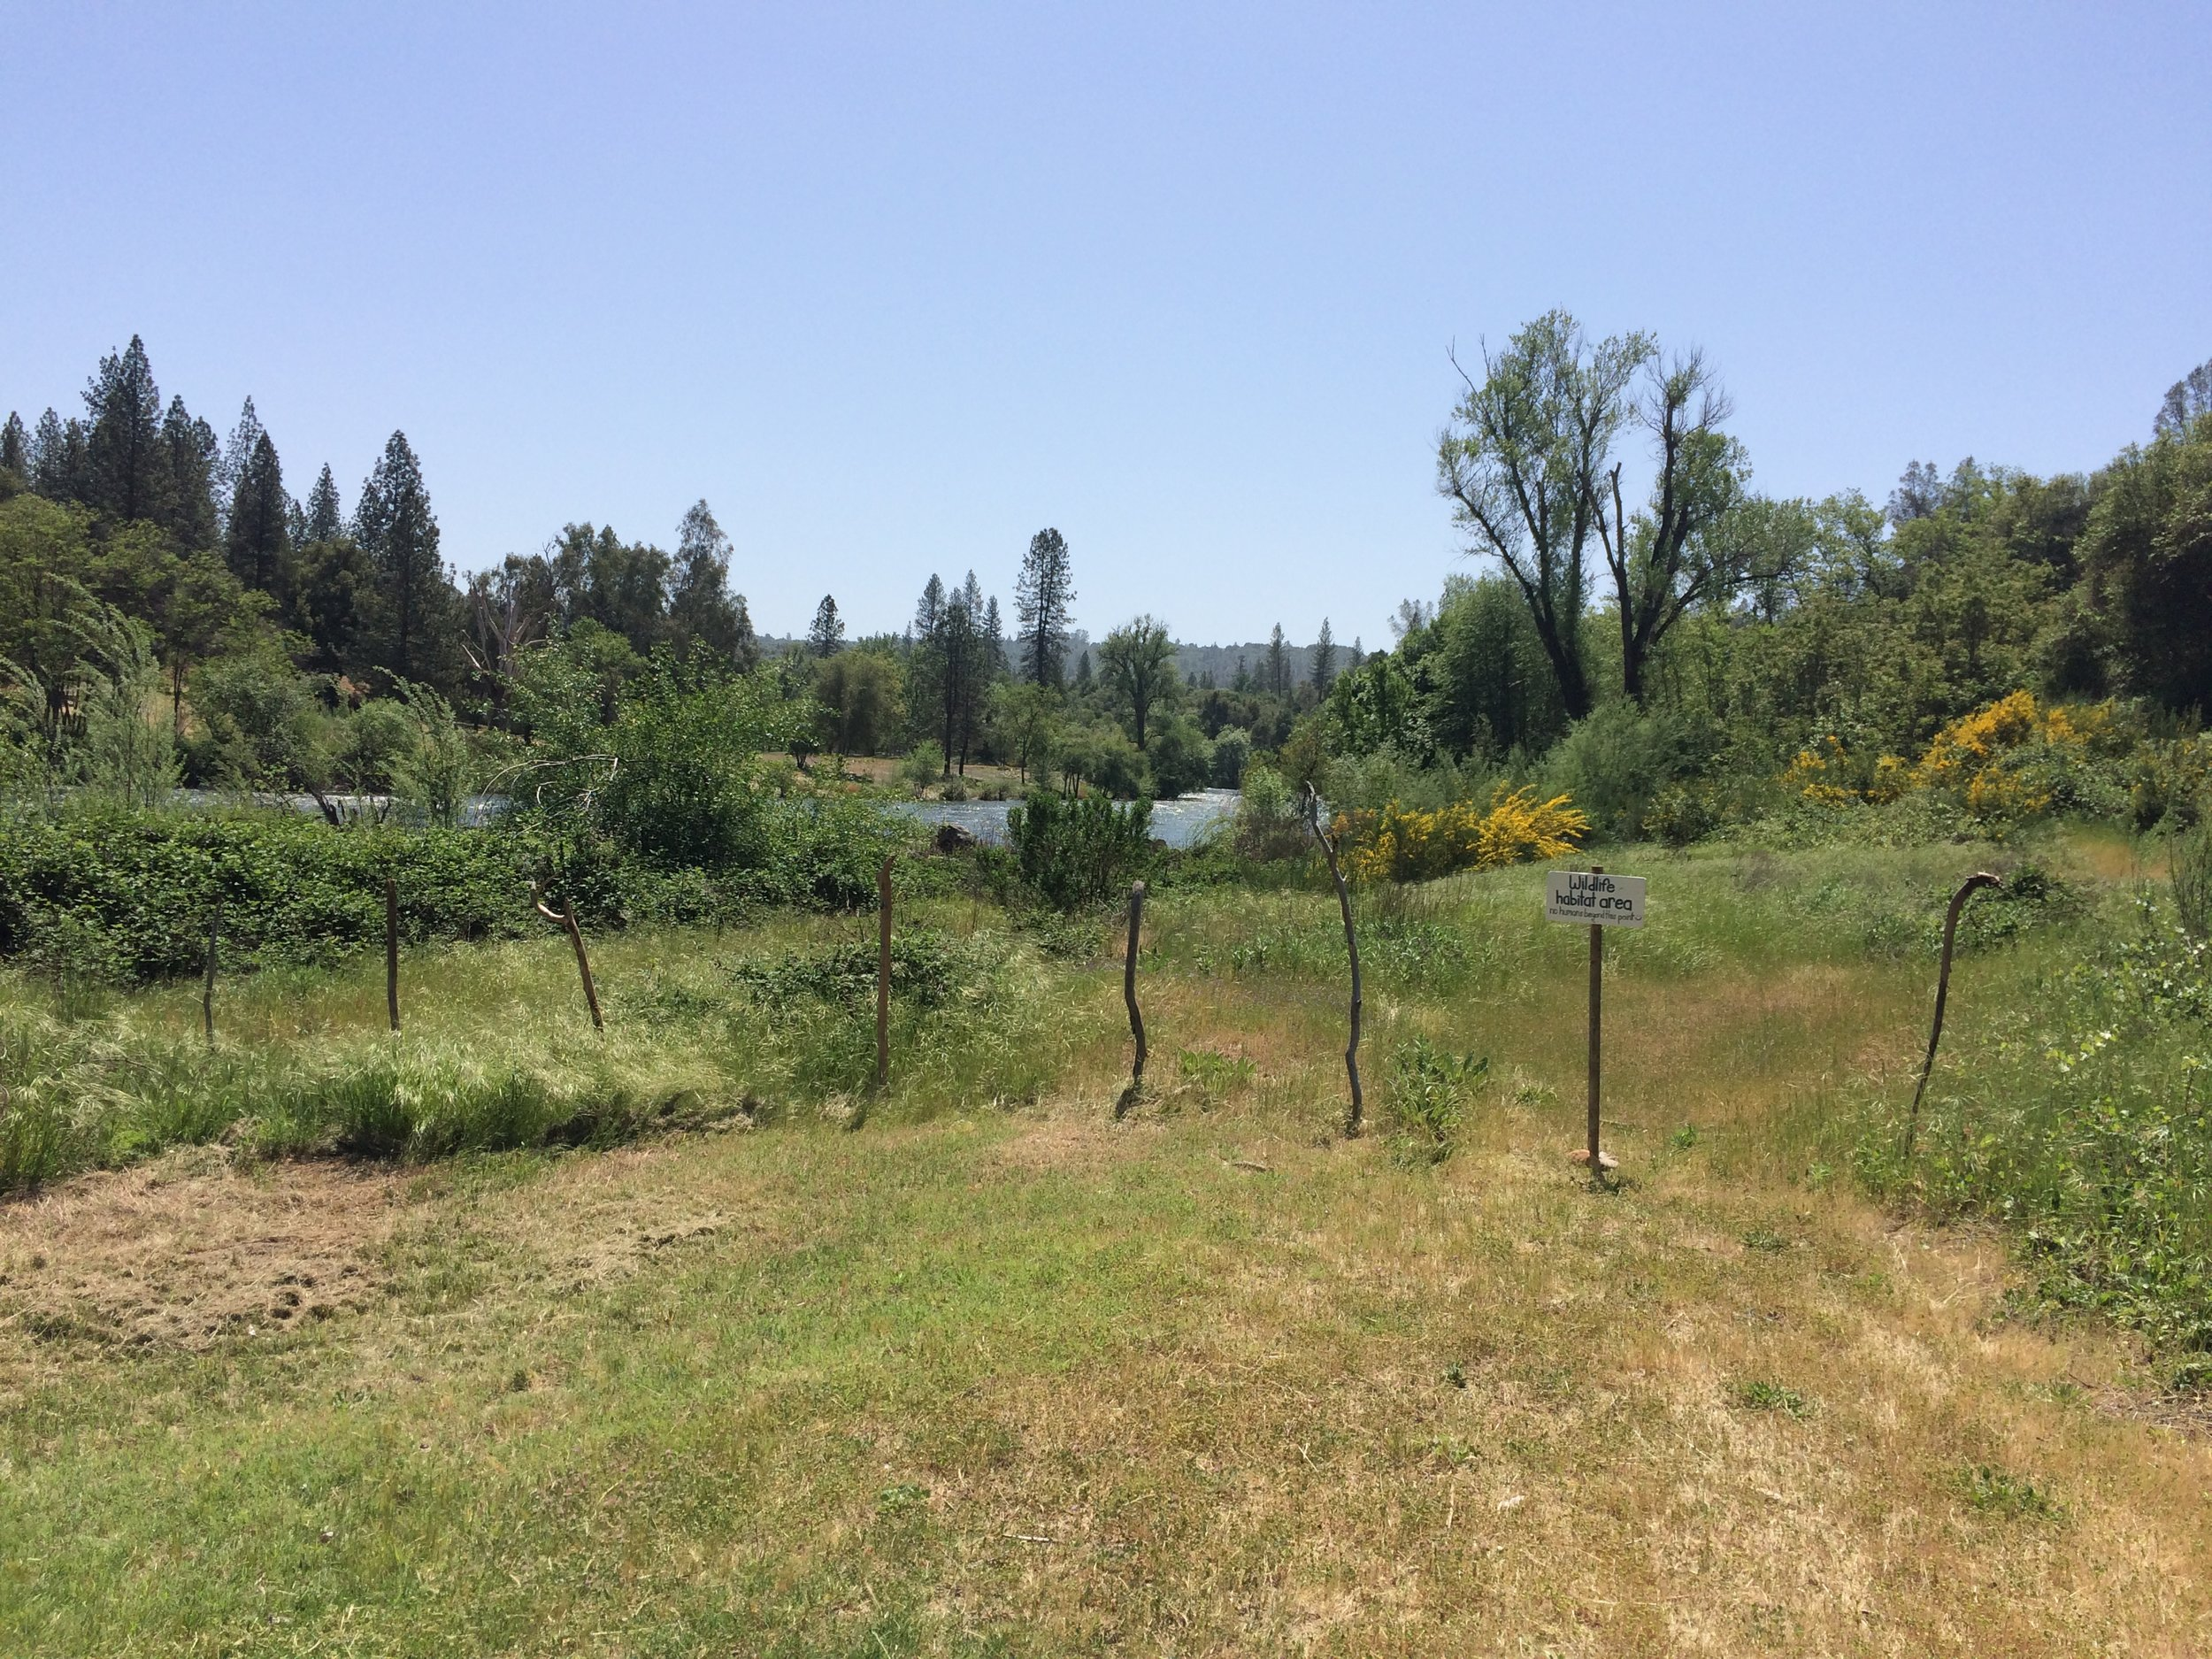 Driftwood 'fence' for wildlfie habitat area.